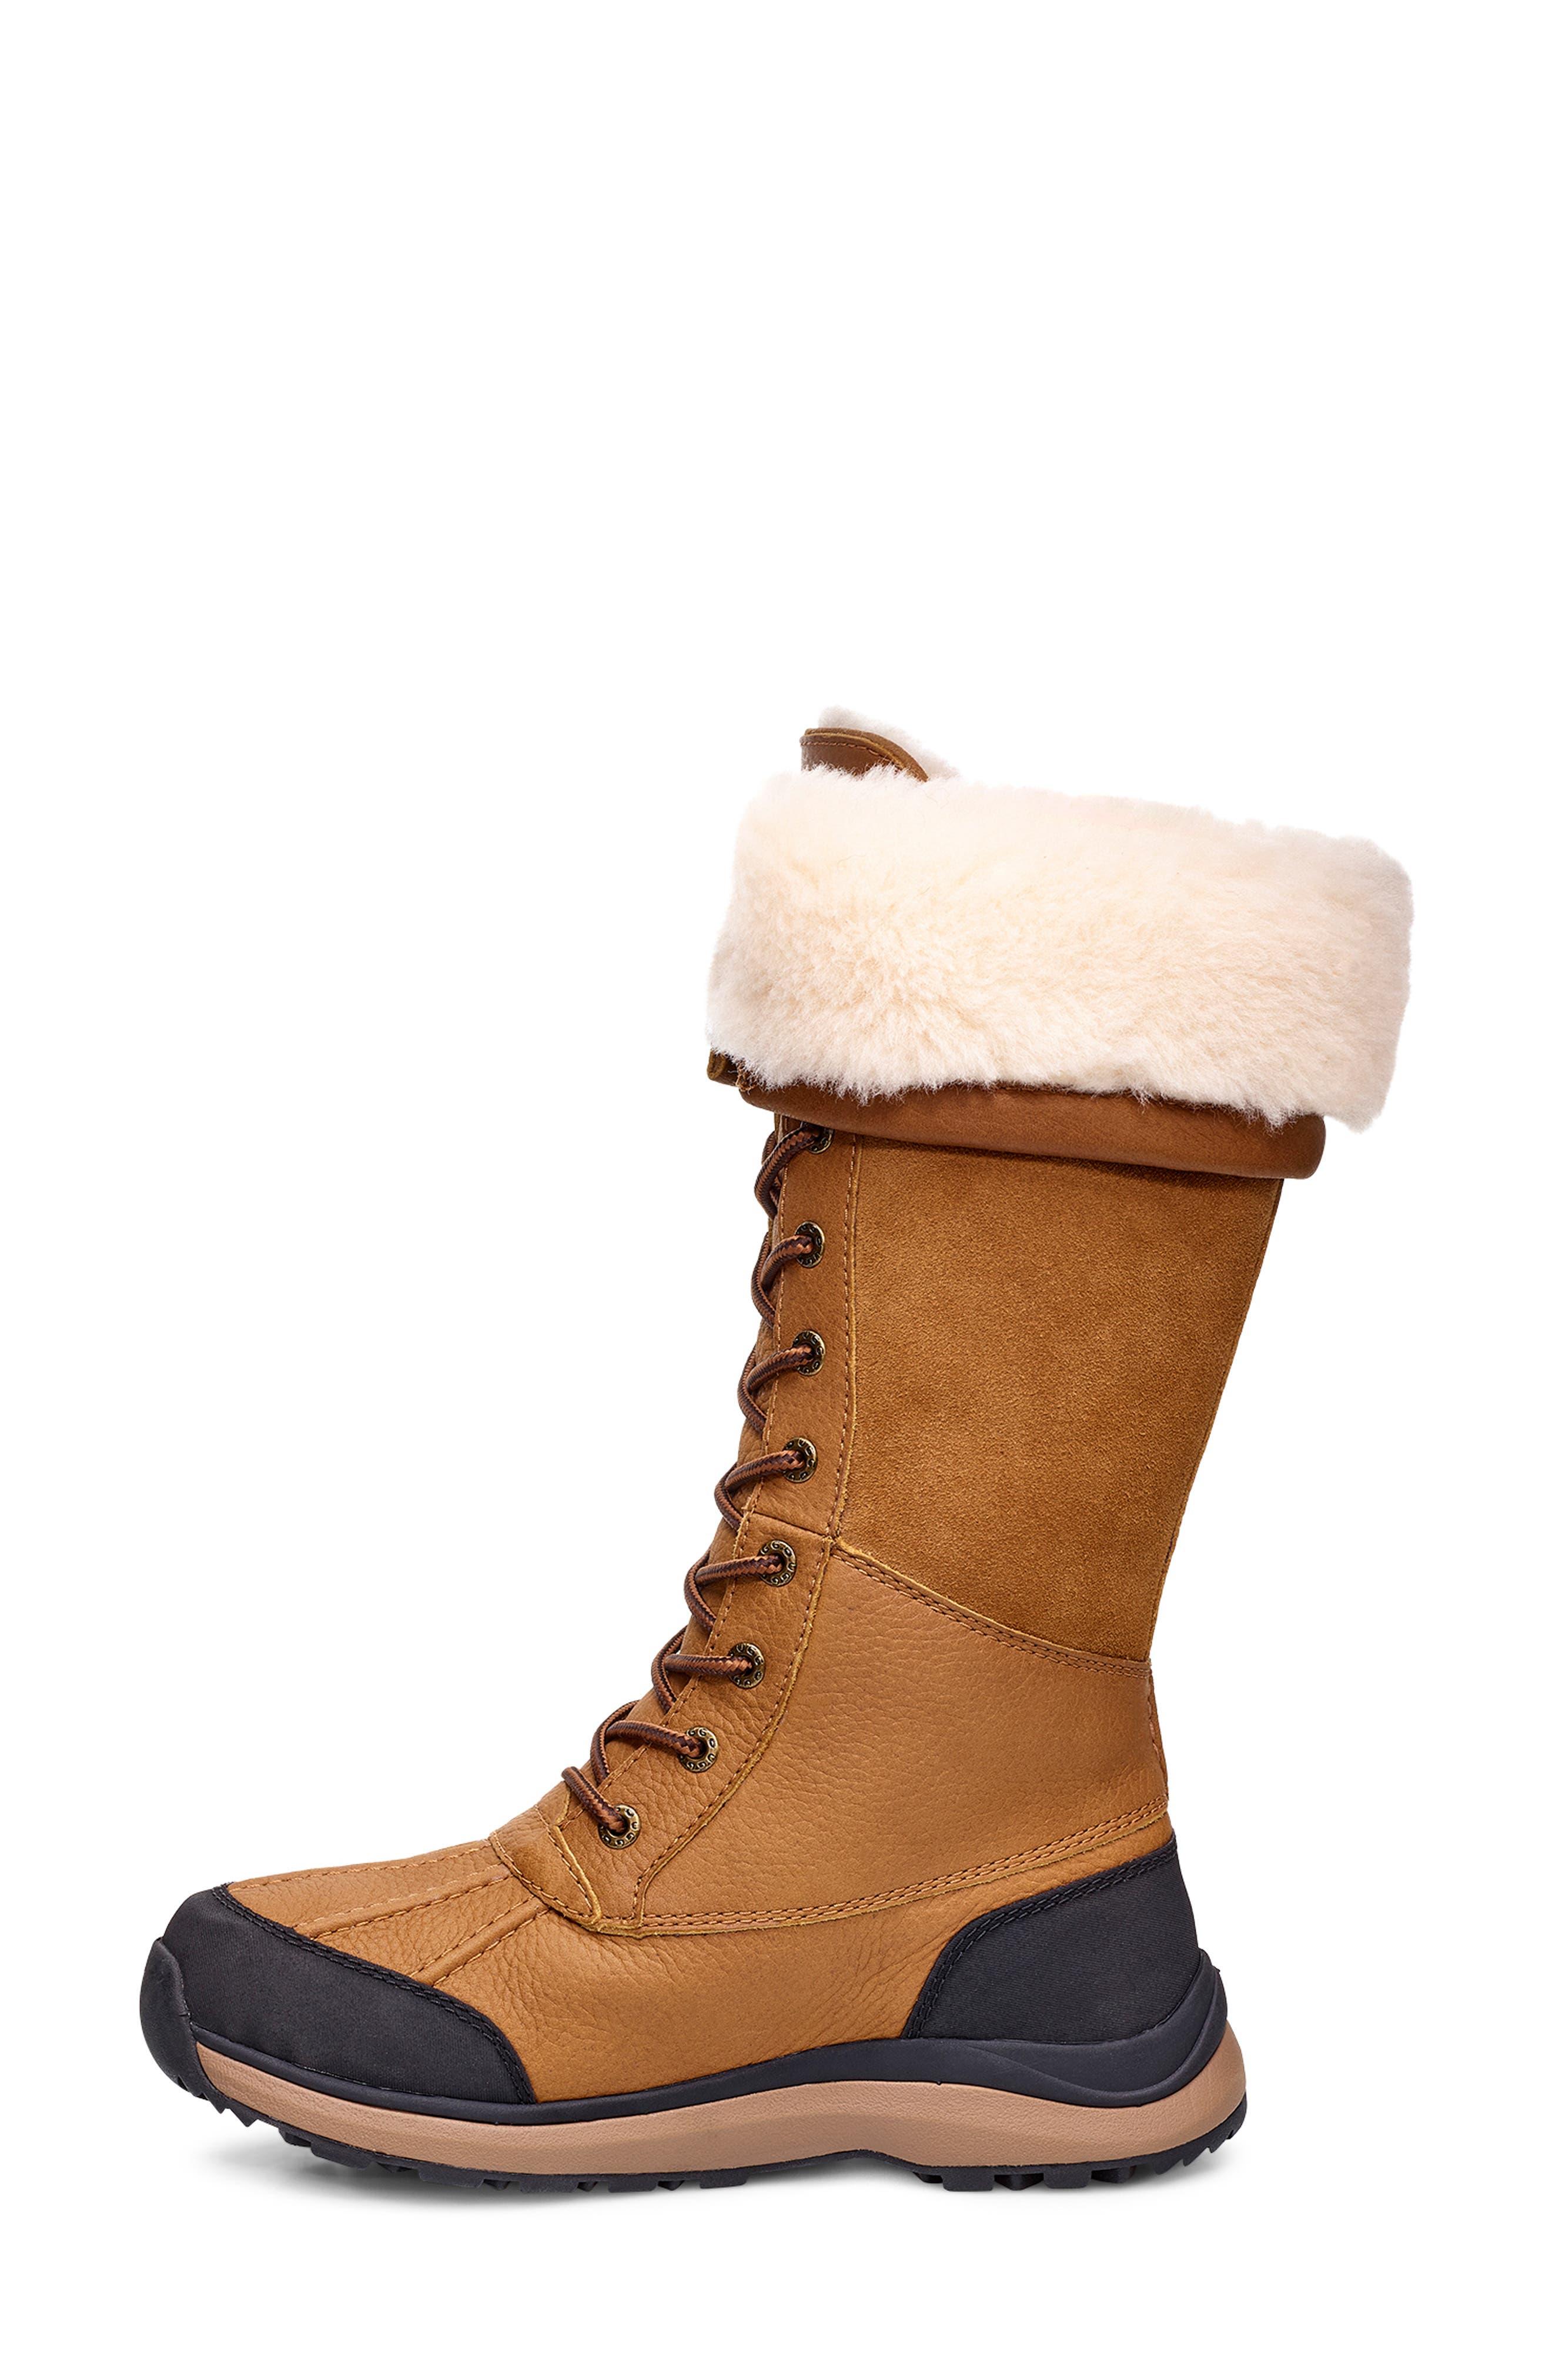 Adirondack II Waterproof Tall Boot,                             Alternate thumbnail 3, color,                             CHESTNUT